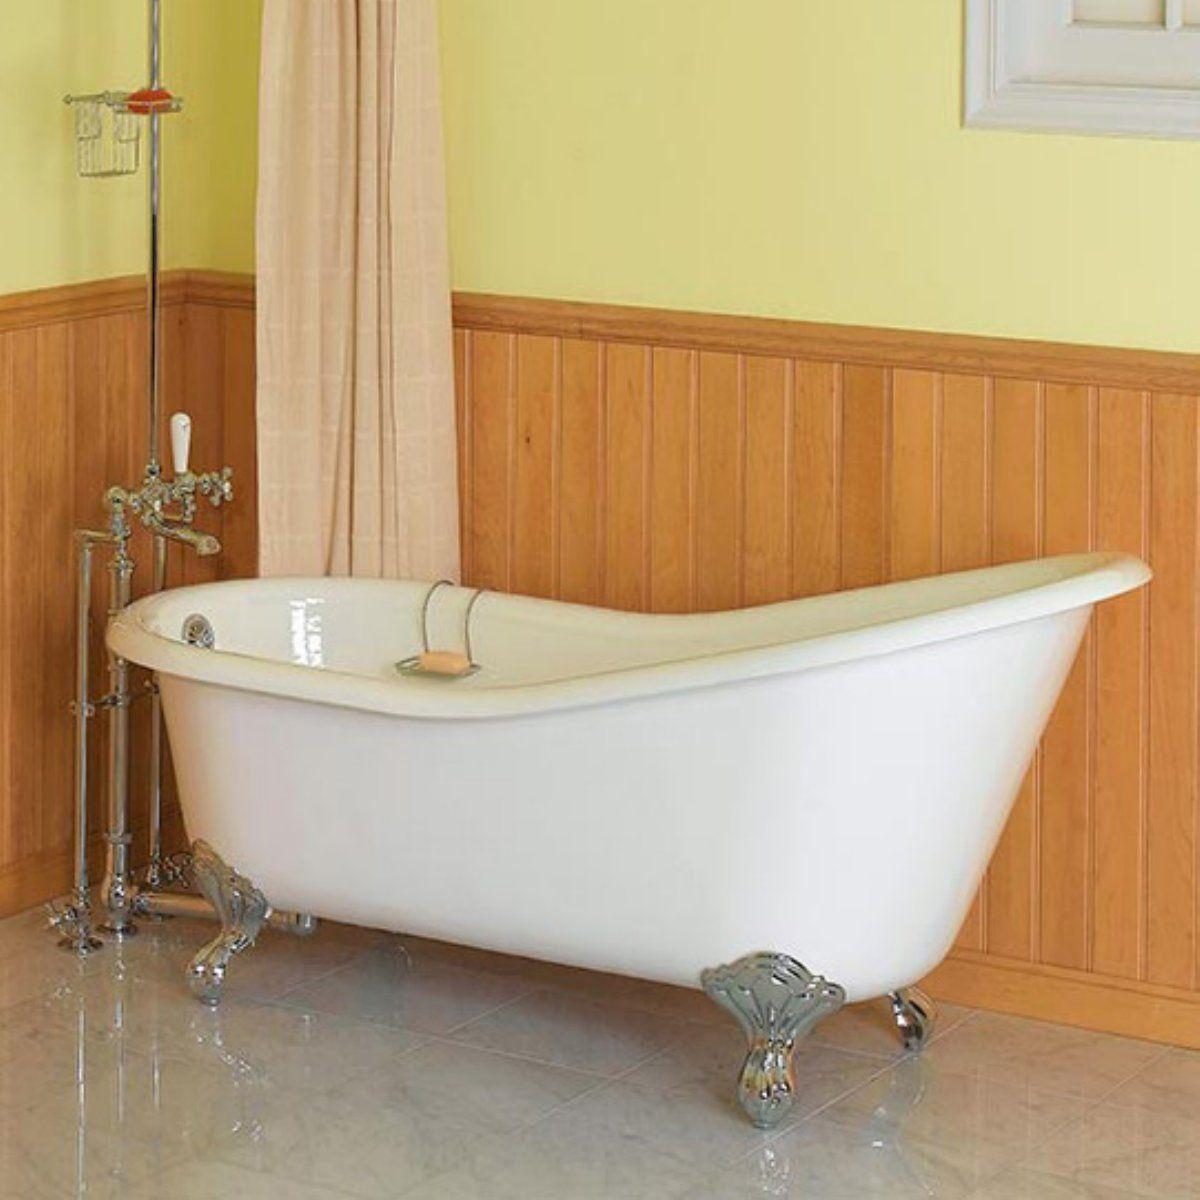 Bathroominspiringsilverlegsclawfoottubwithsingledrapesin Gorgeous Victorian Bathroom Design Ideas Design Ideas